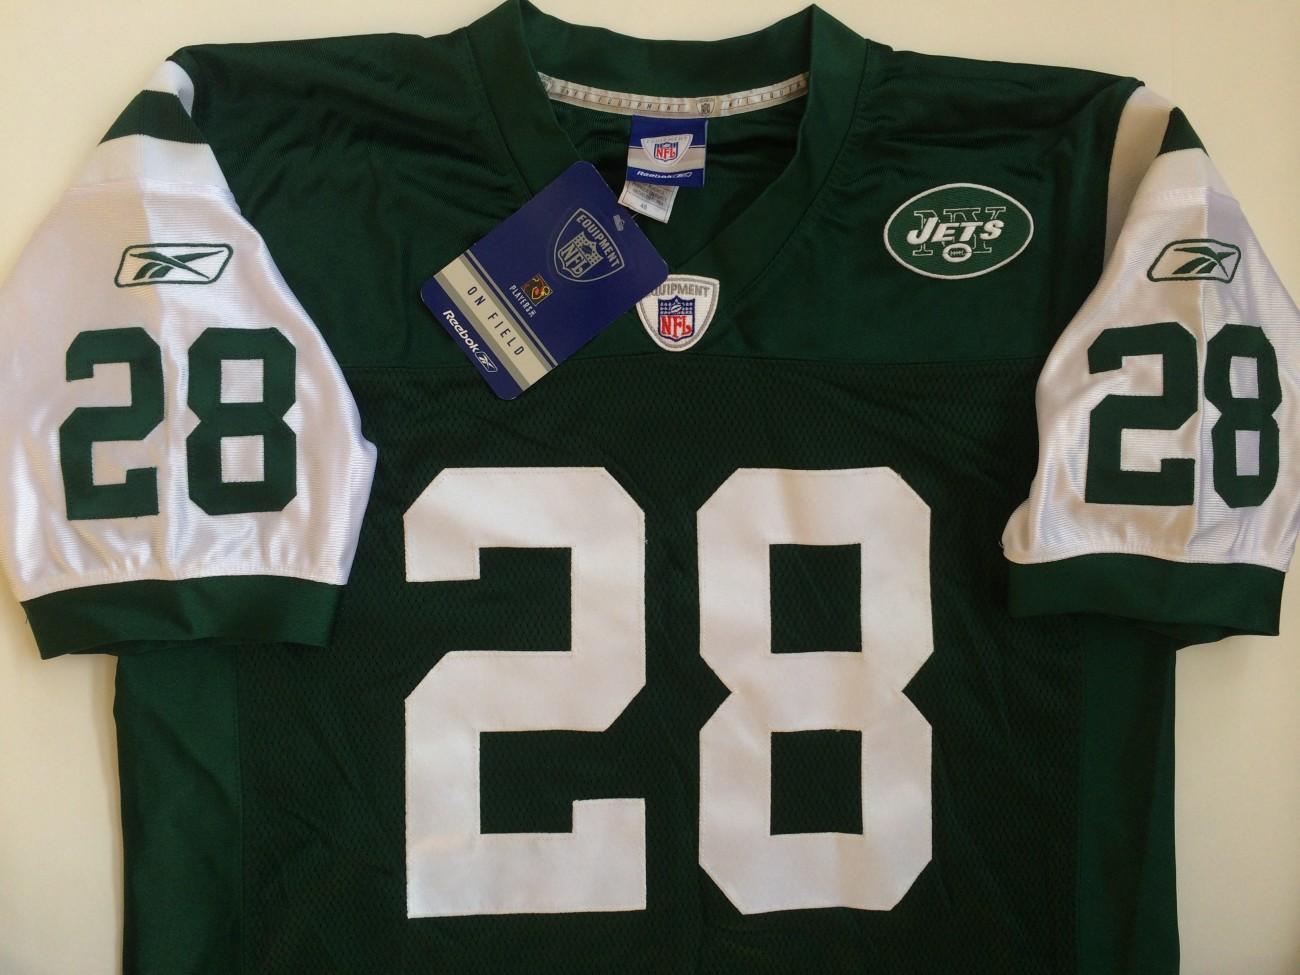 2005 Curtis Martin New York Jets Authentic Reebok NFL Jersey